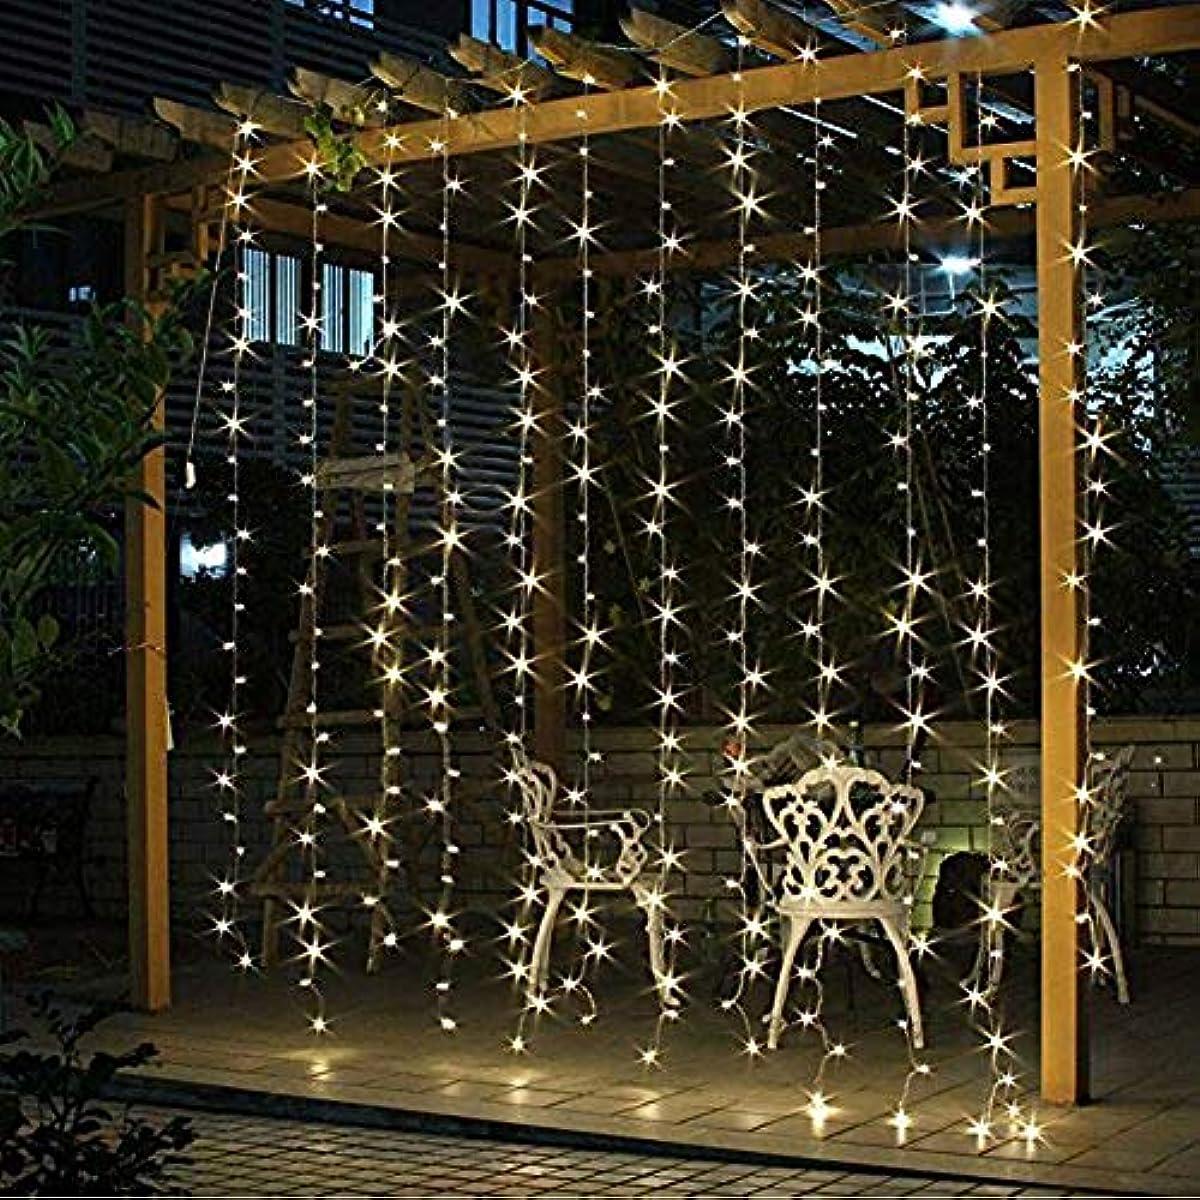 Wedding Altar Lighting: Tent Lights For Wedding Ceiling Altar Decorations Drape